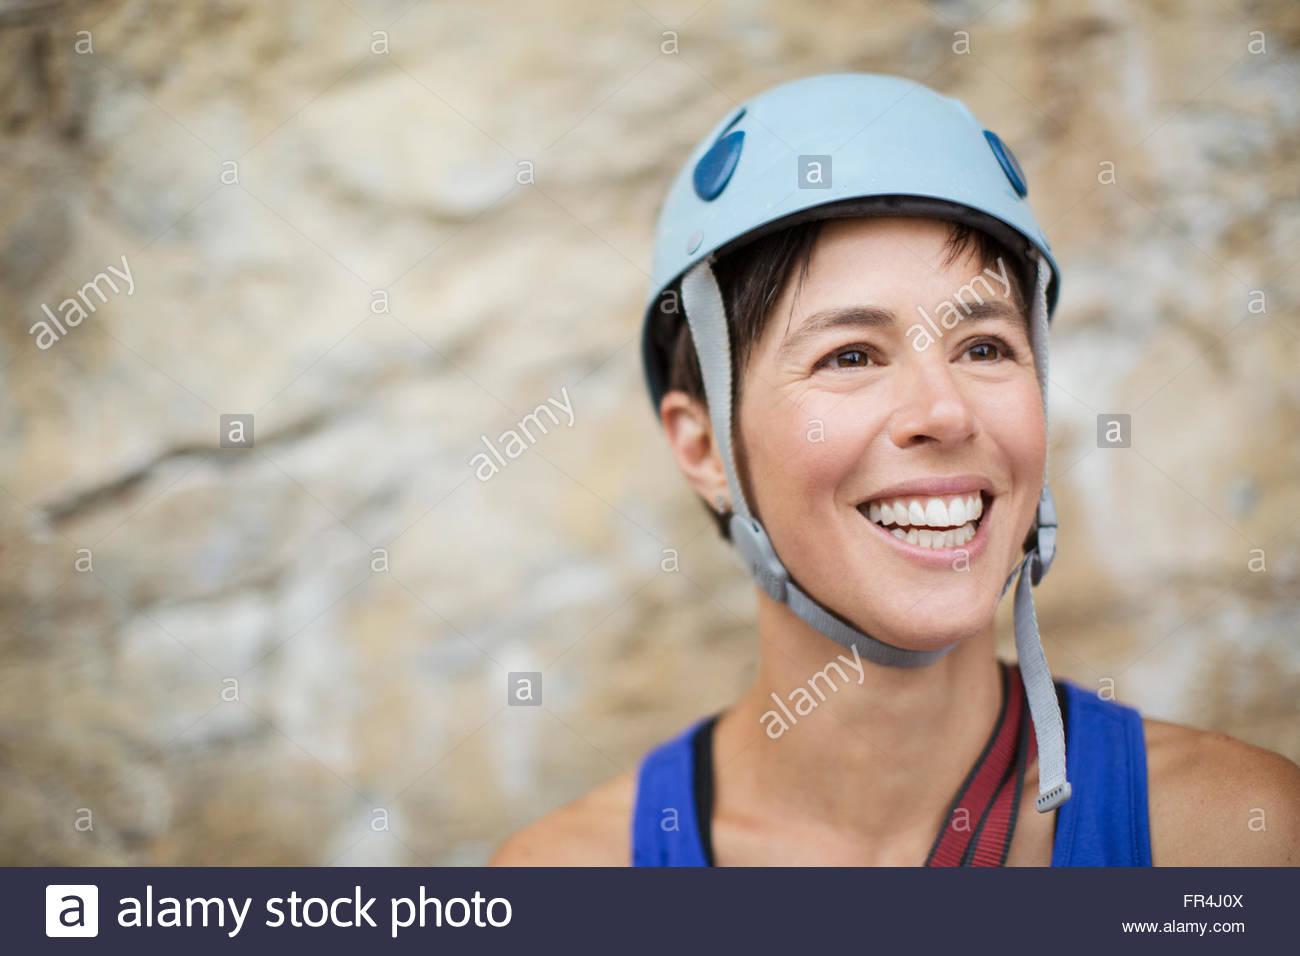 pretty, female rock climber wearing helmut - Stock Image